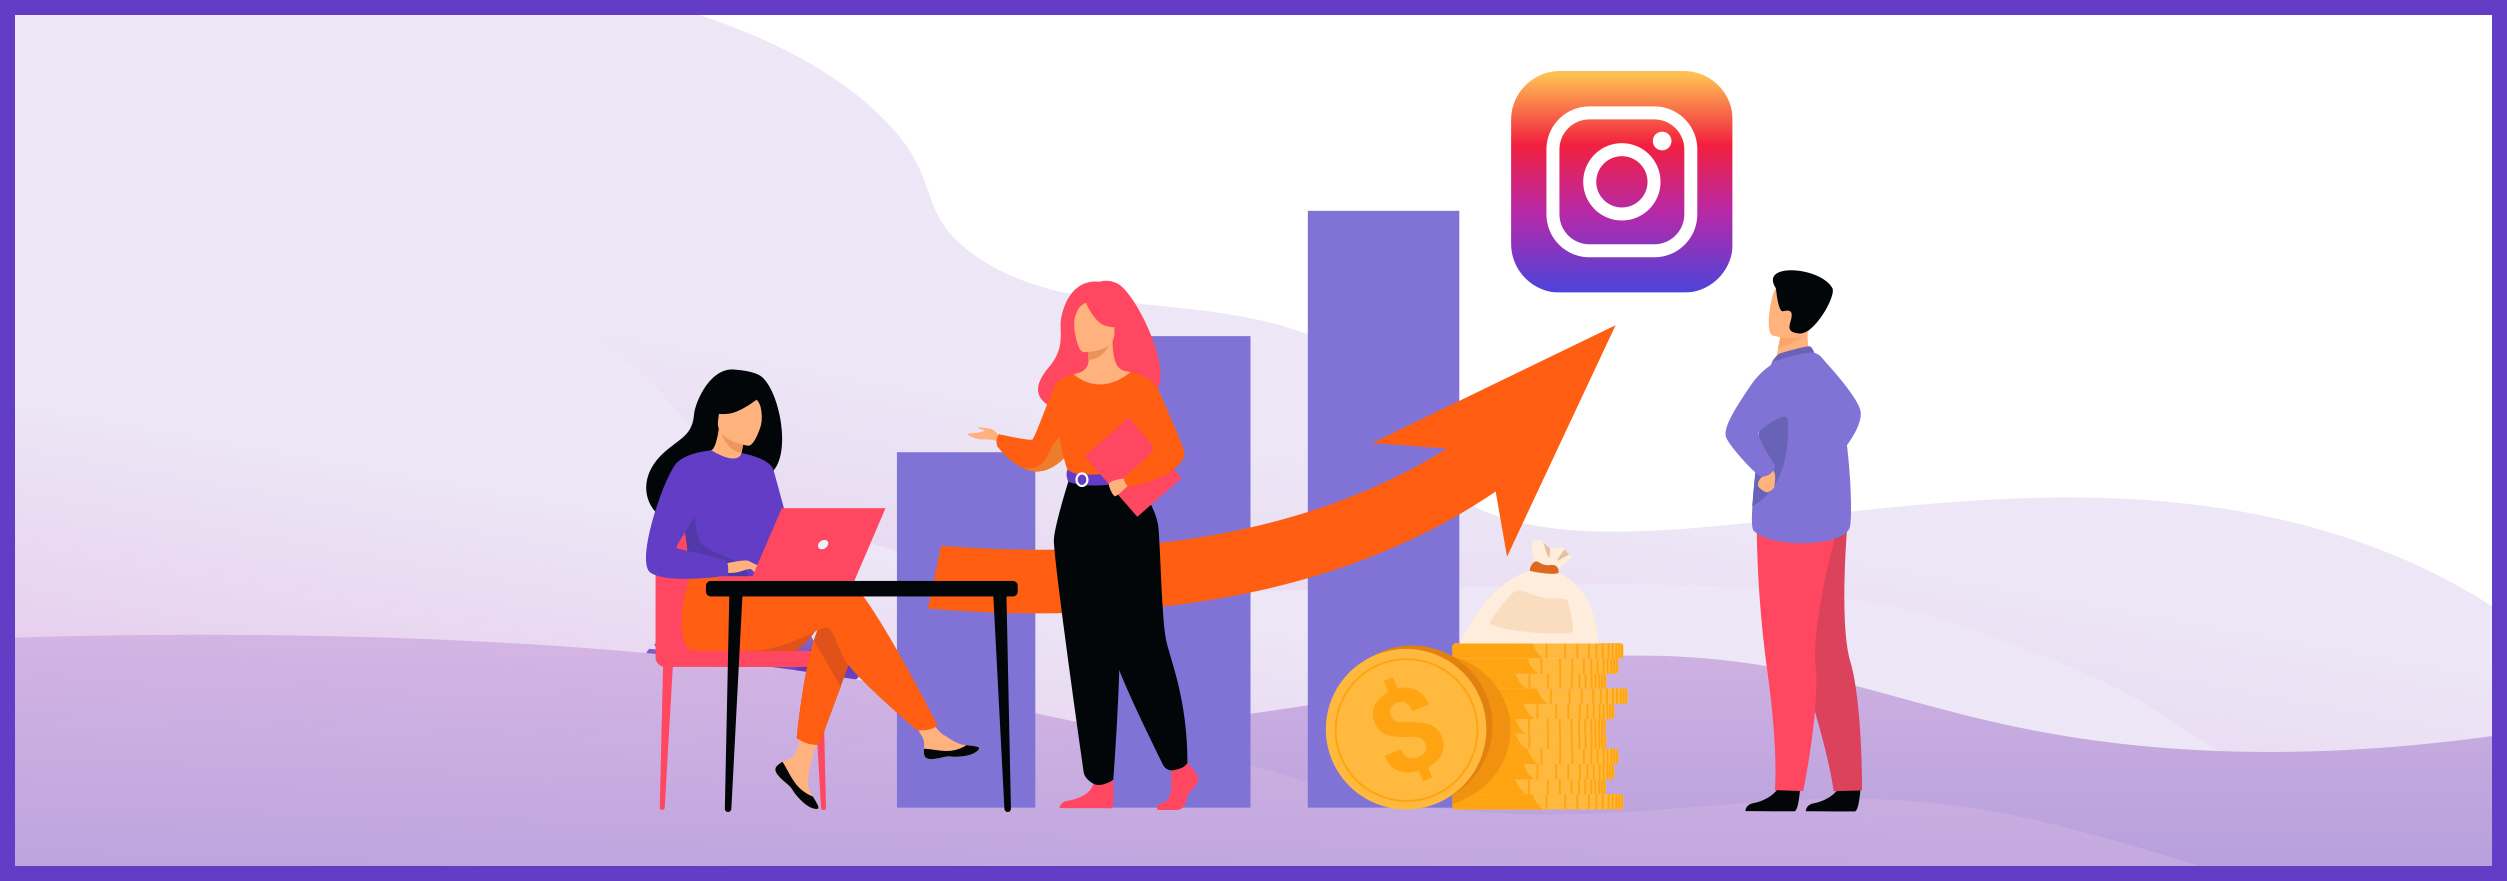 Instagram Growth Hacks: Build Your Brand Organically